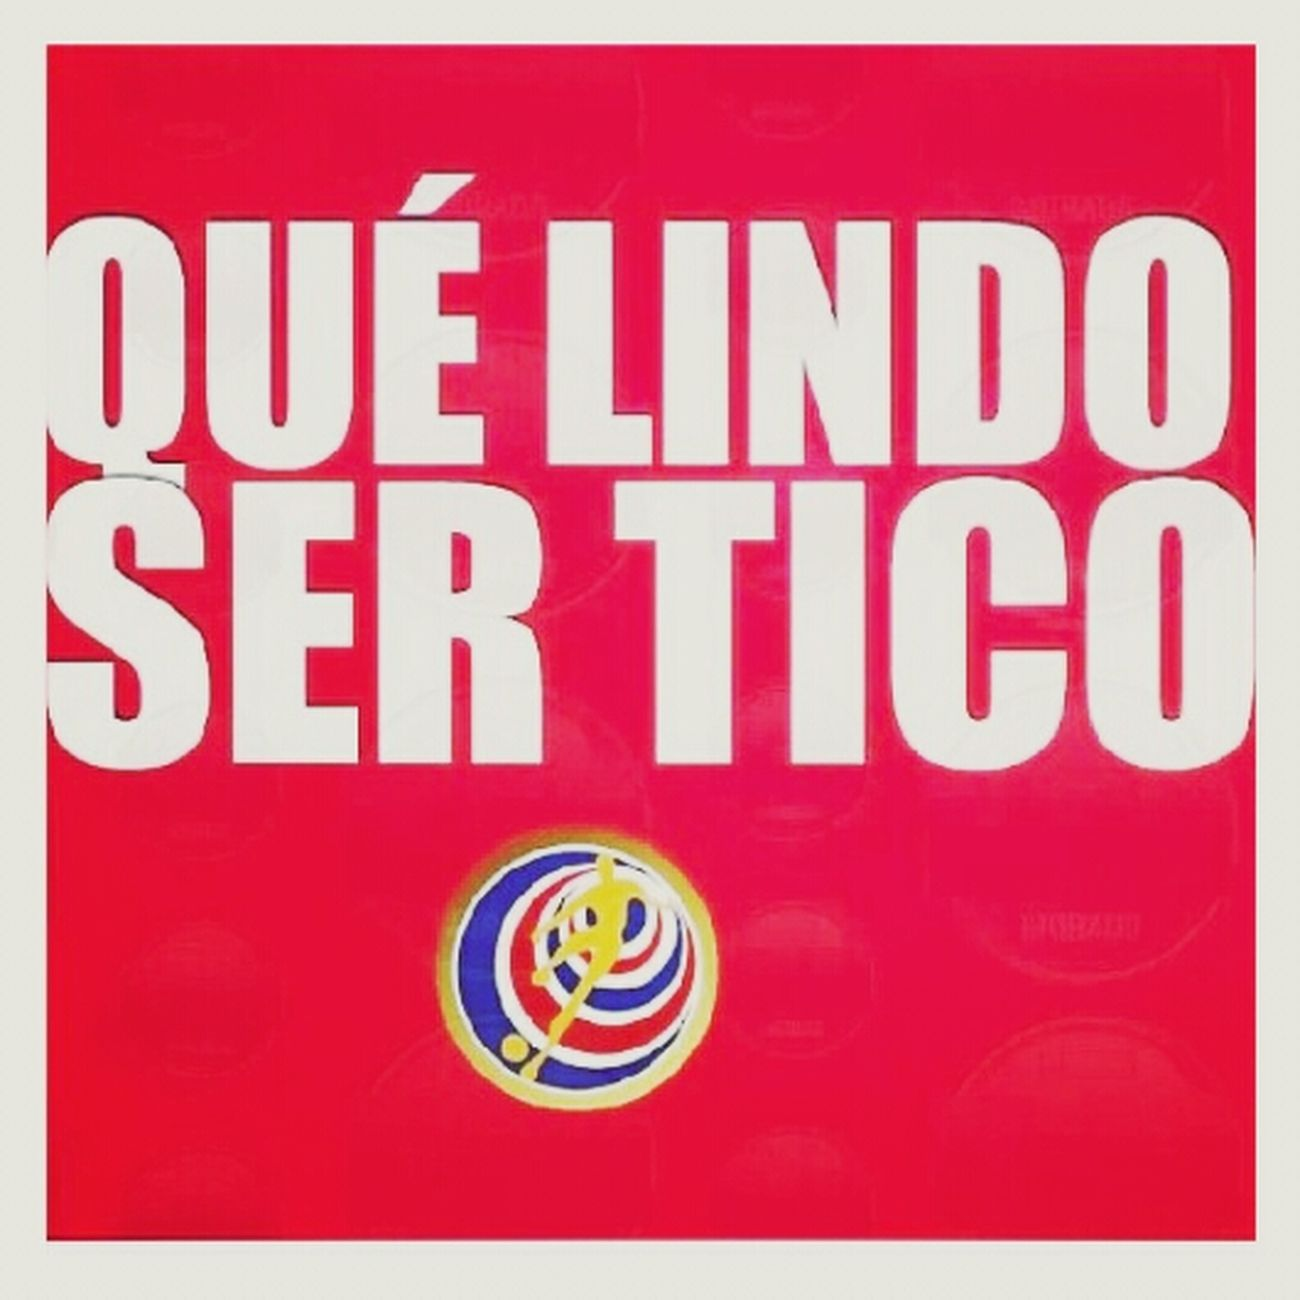 Que lindo ser tico Costarica Sele Ticos Brazil2014